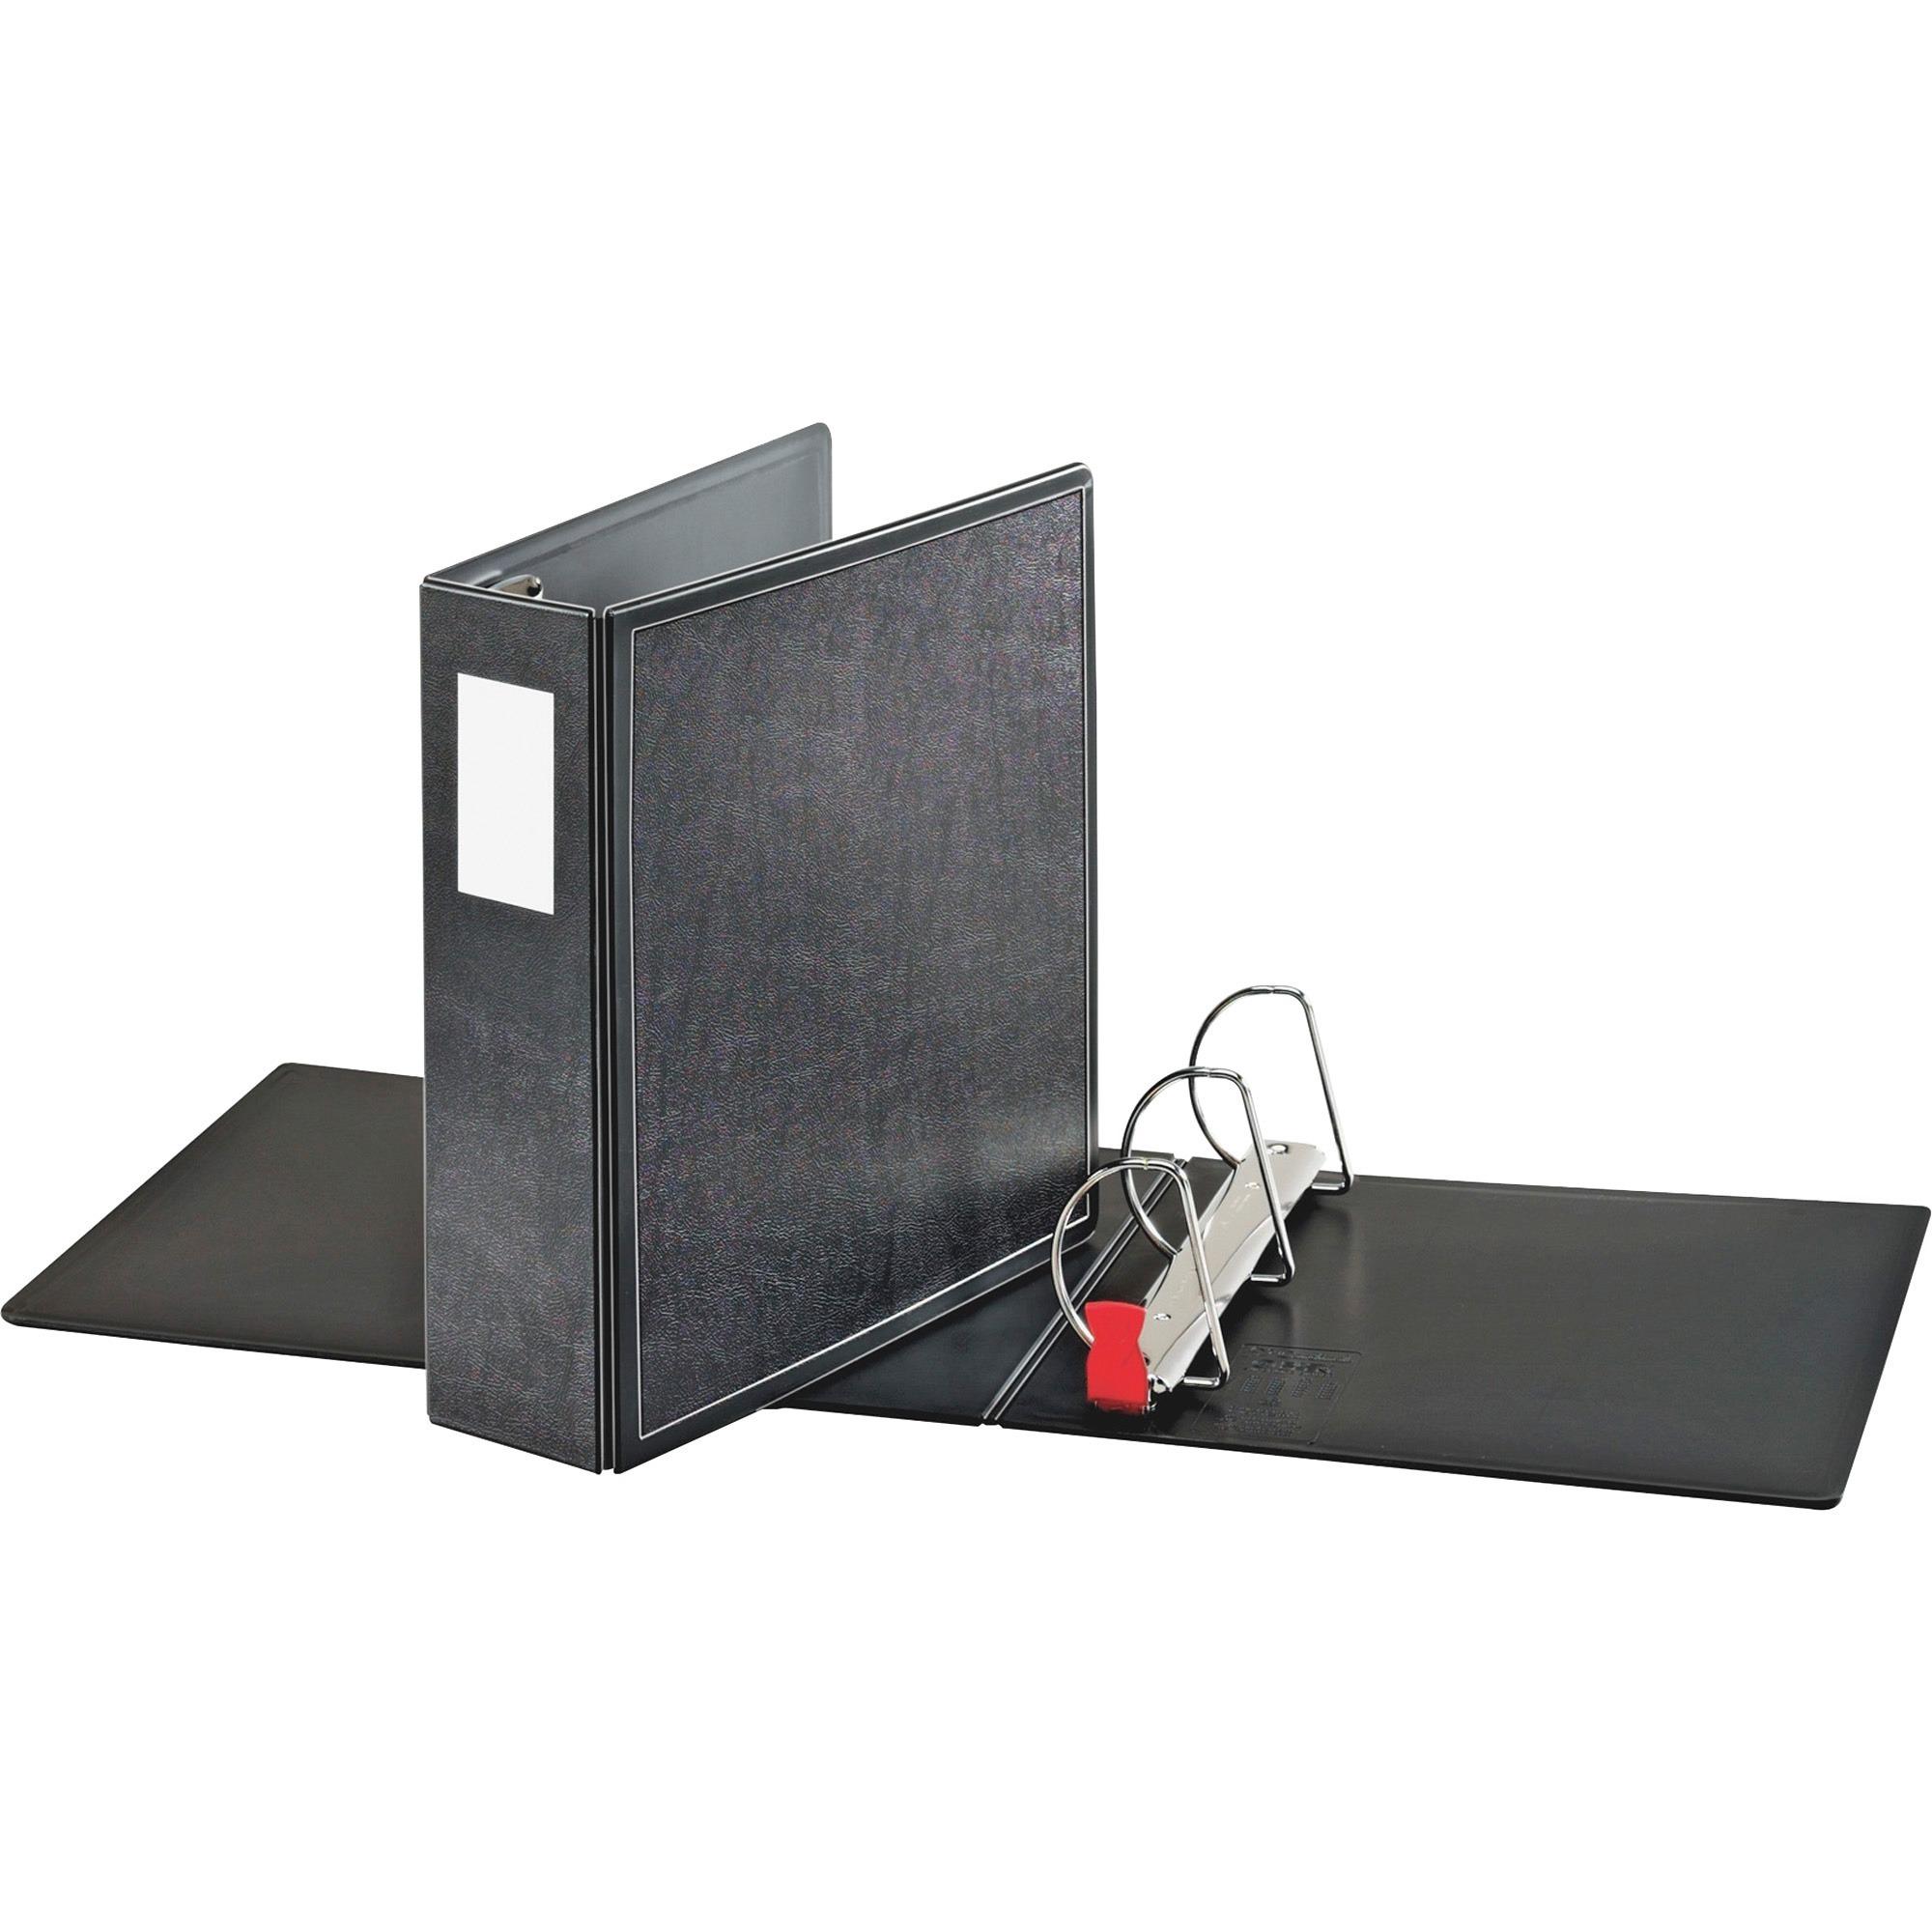 HOME :: Office Supplies :: Binders & Accessories